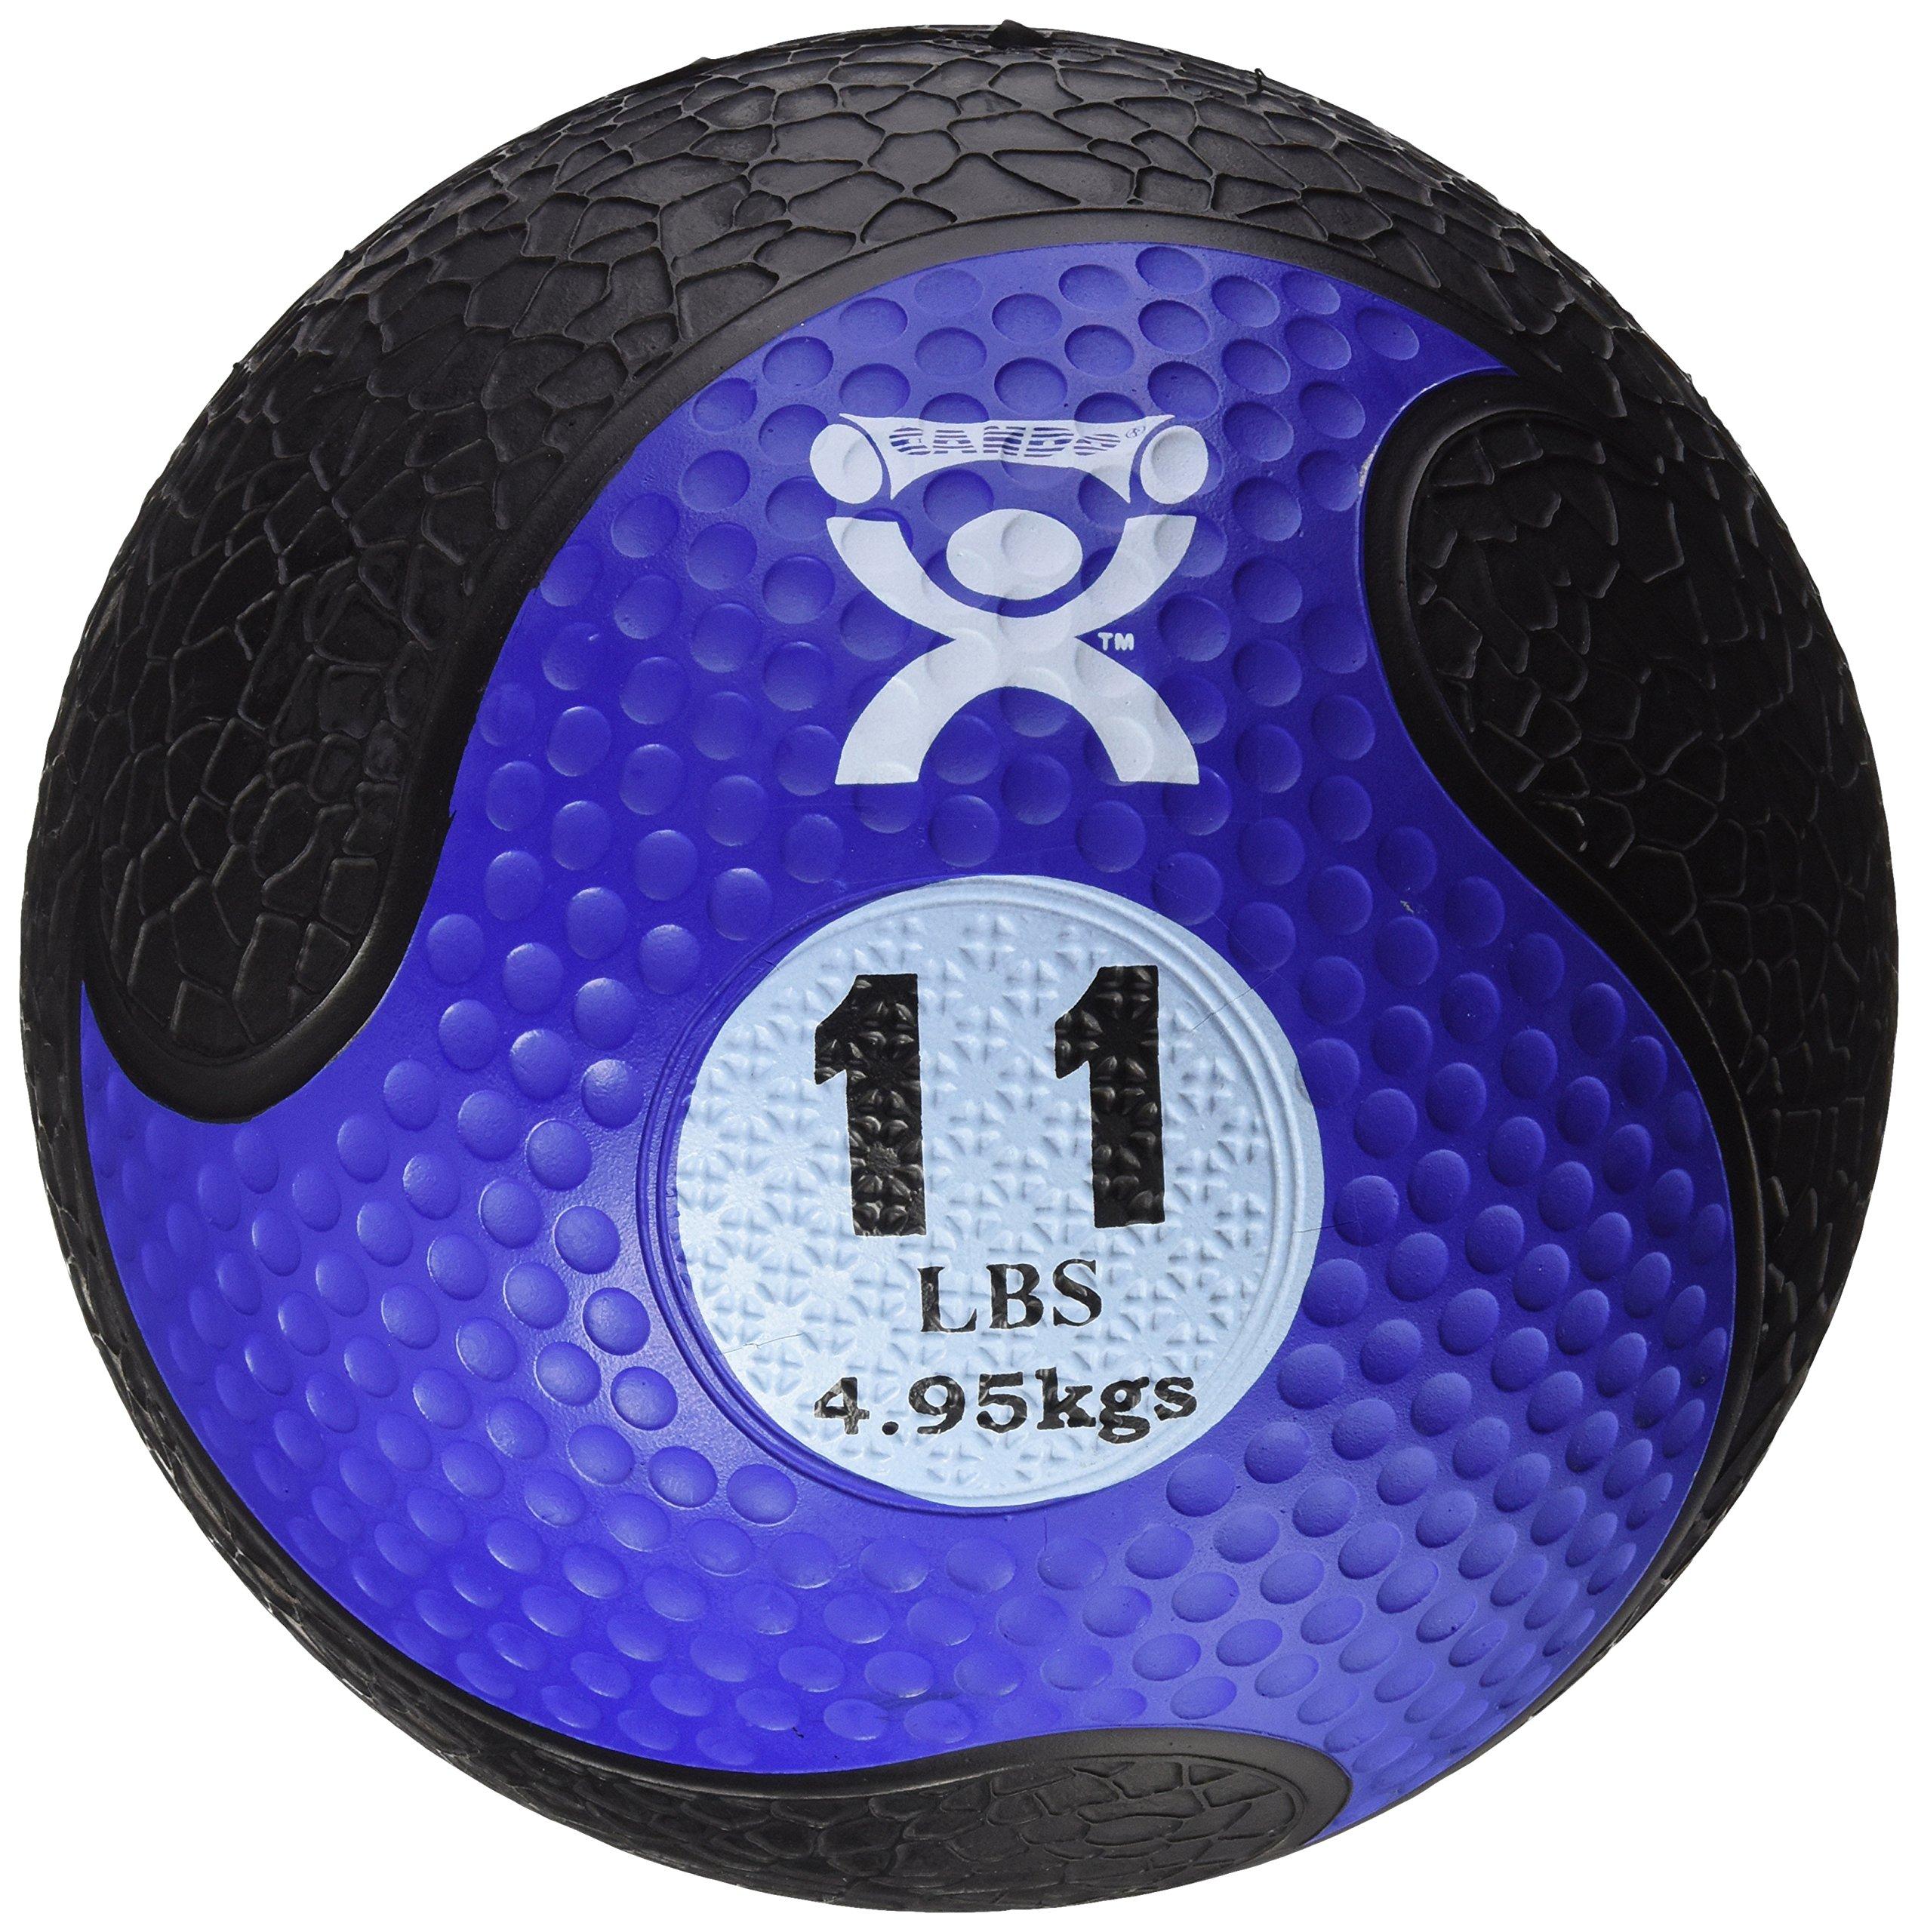 CanDo Bouncing Plyoball, Blue, 11 Pound